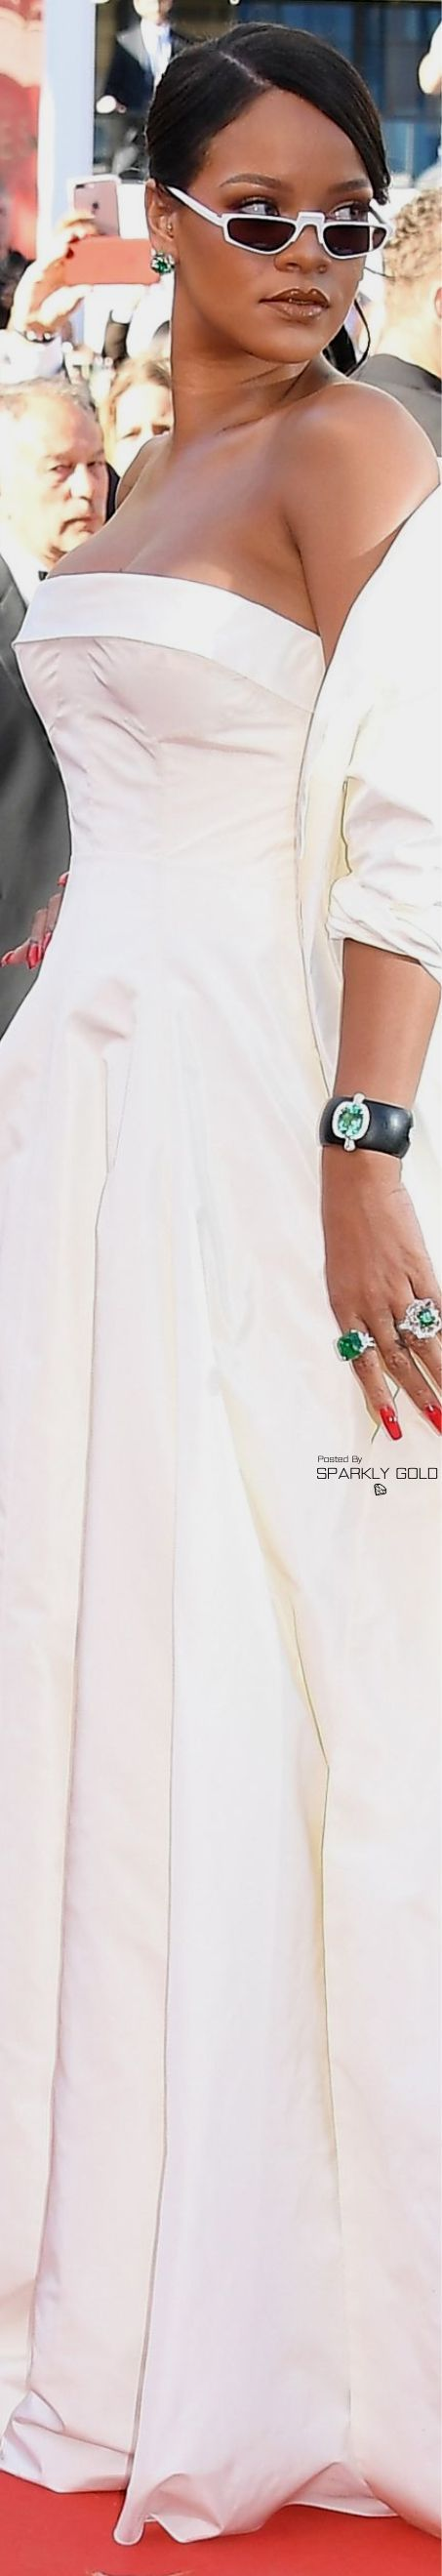 Rihanna/Cannes Film Festival 2017 (Dior)